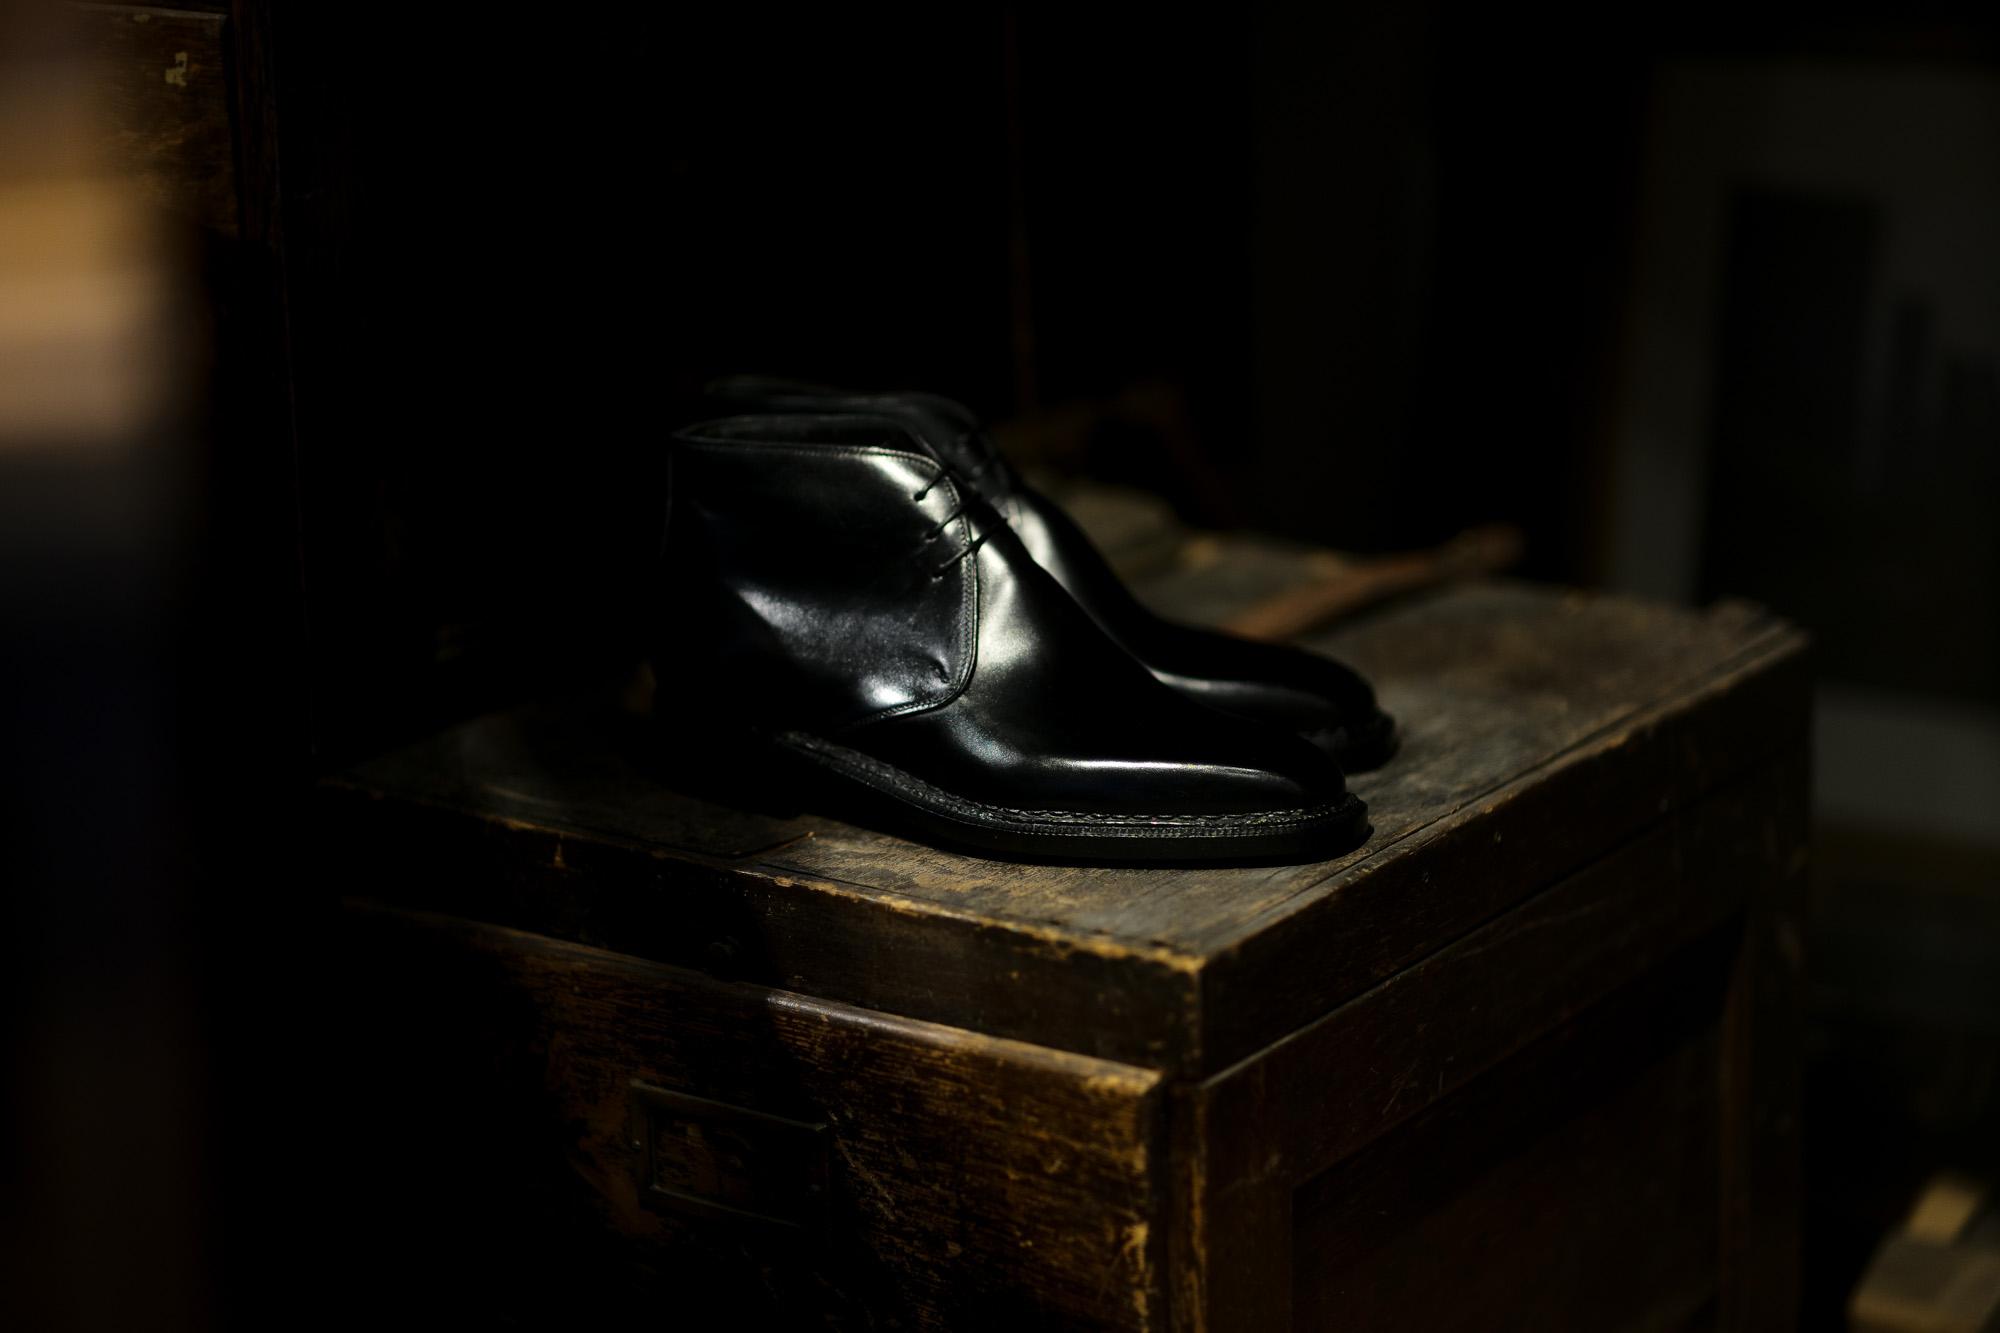 ENZO BONAFE (エンツォボナフェ) ART.3722 Chukka boots Du Puy Vitello デュプイ社ボックスカーフ チャッカブーツ NERO (ブラック) made in italy (イタリア製) 2021 愛知 名古屋 Alto e Diritto altoediritto アルトエデリット レザーブーツ